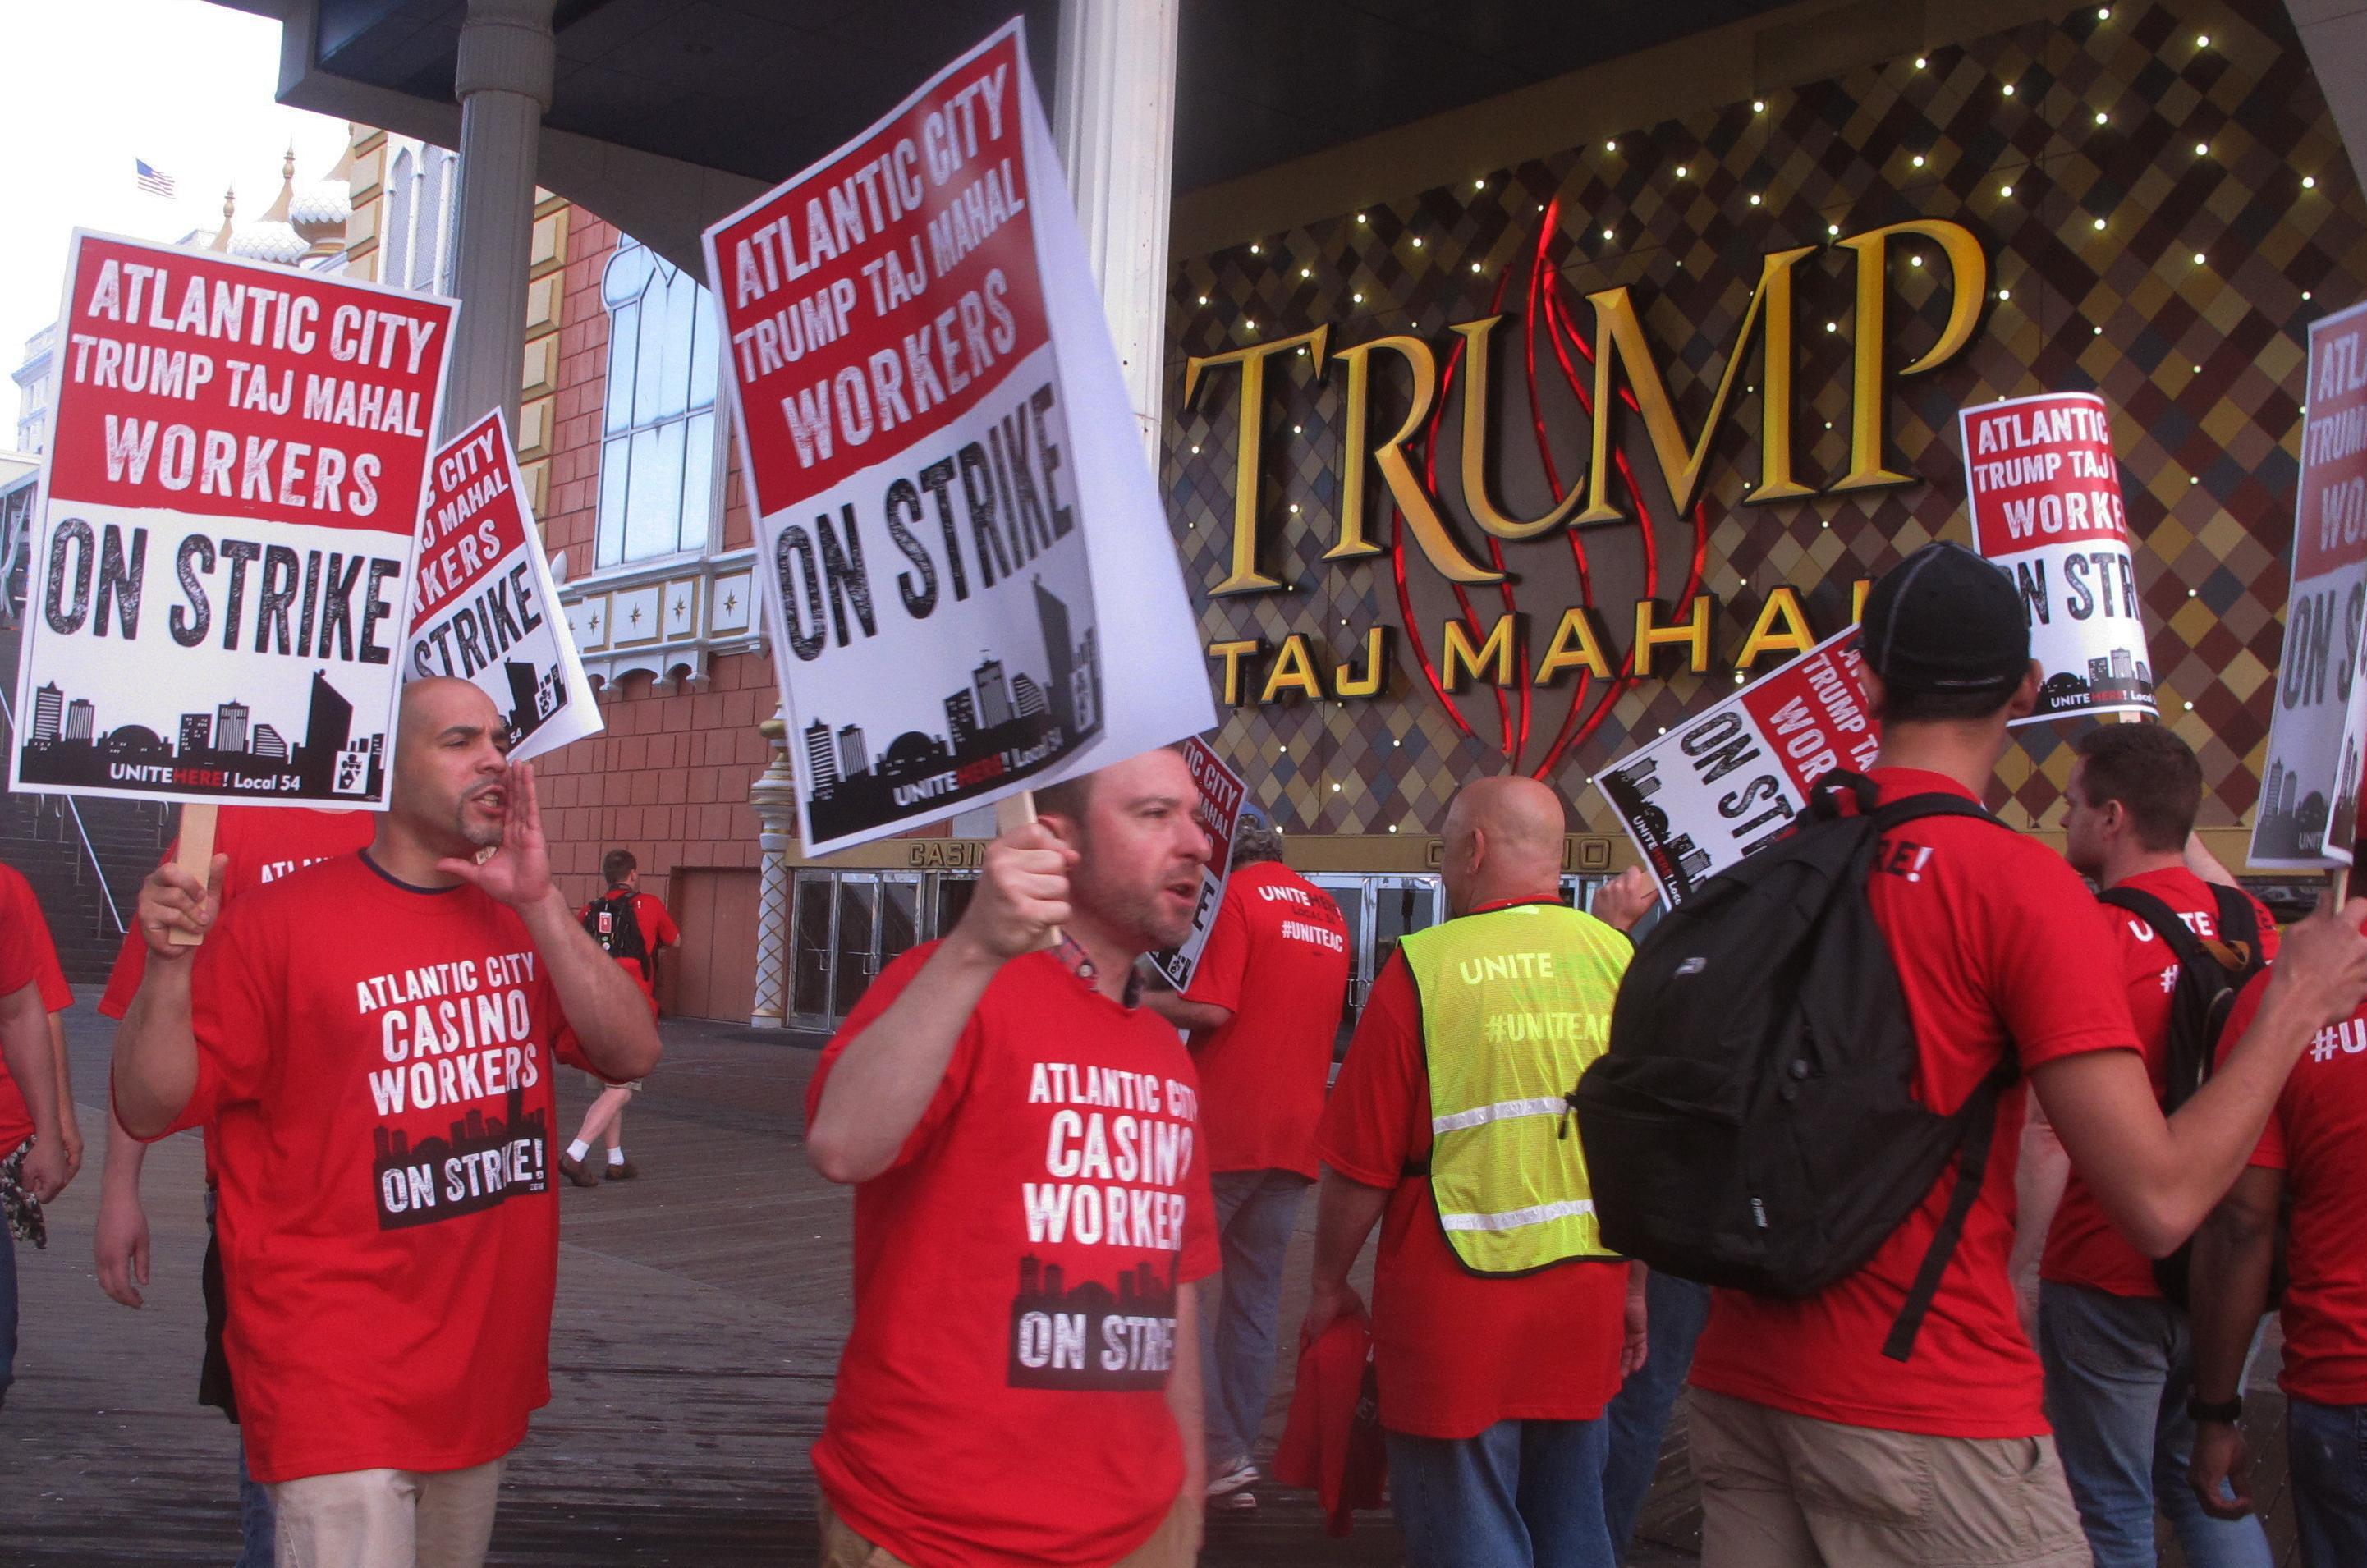 Atlantic city casino strike casino montreal investors